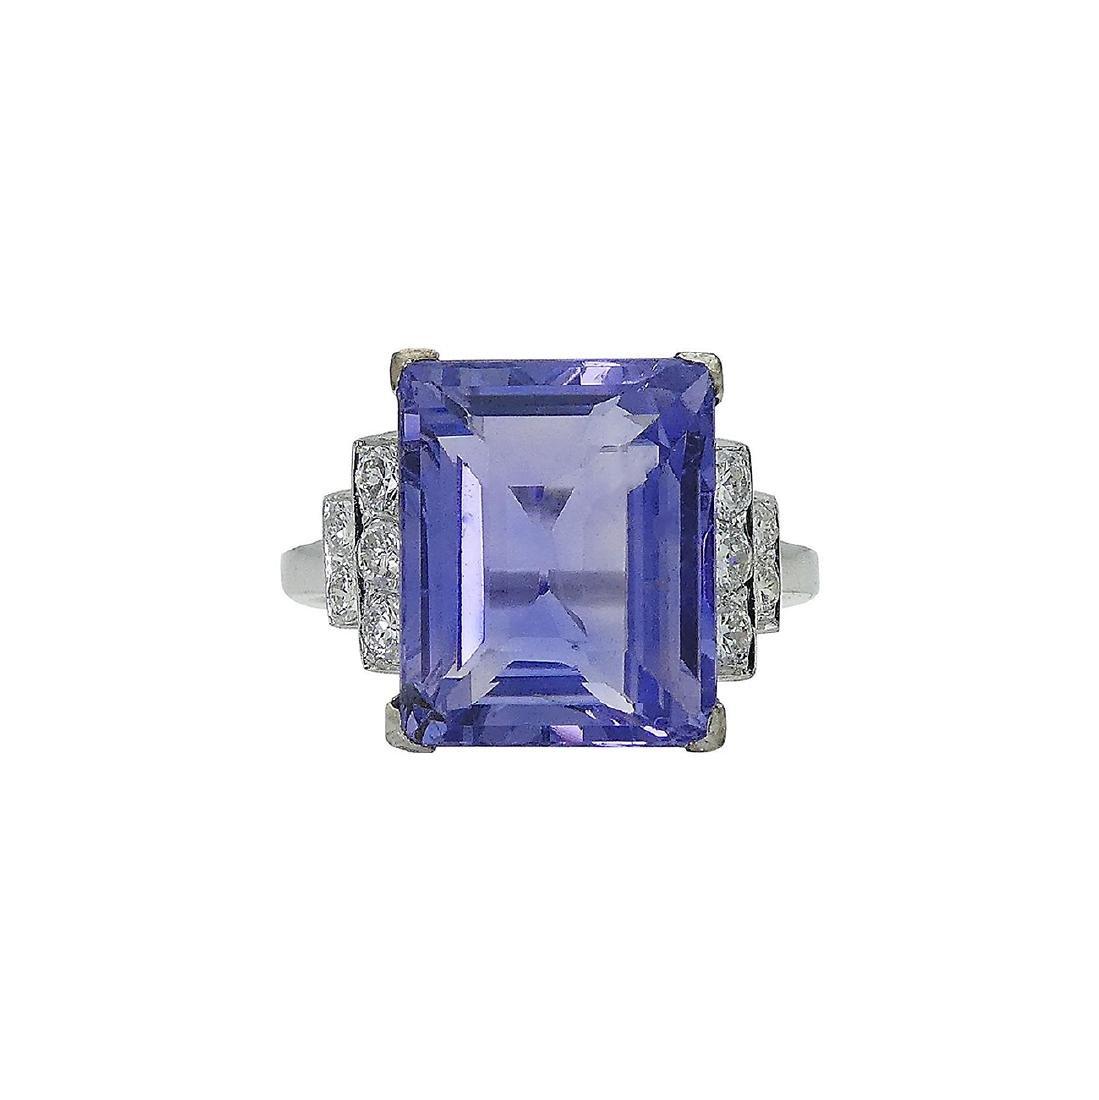 Designer Platinum Diamond & Sapphire Ring Size 6 - 2